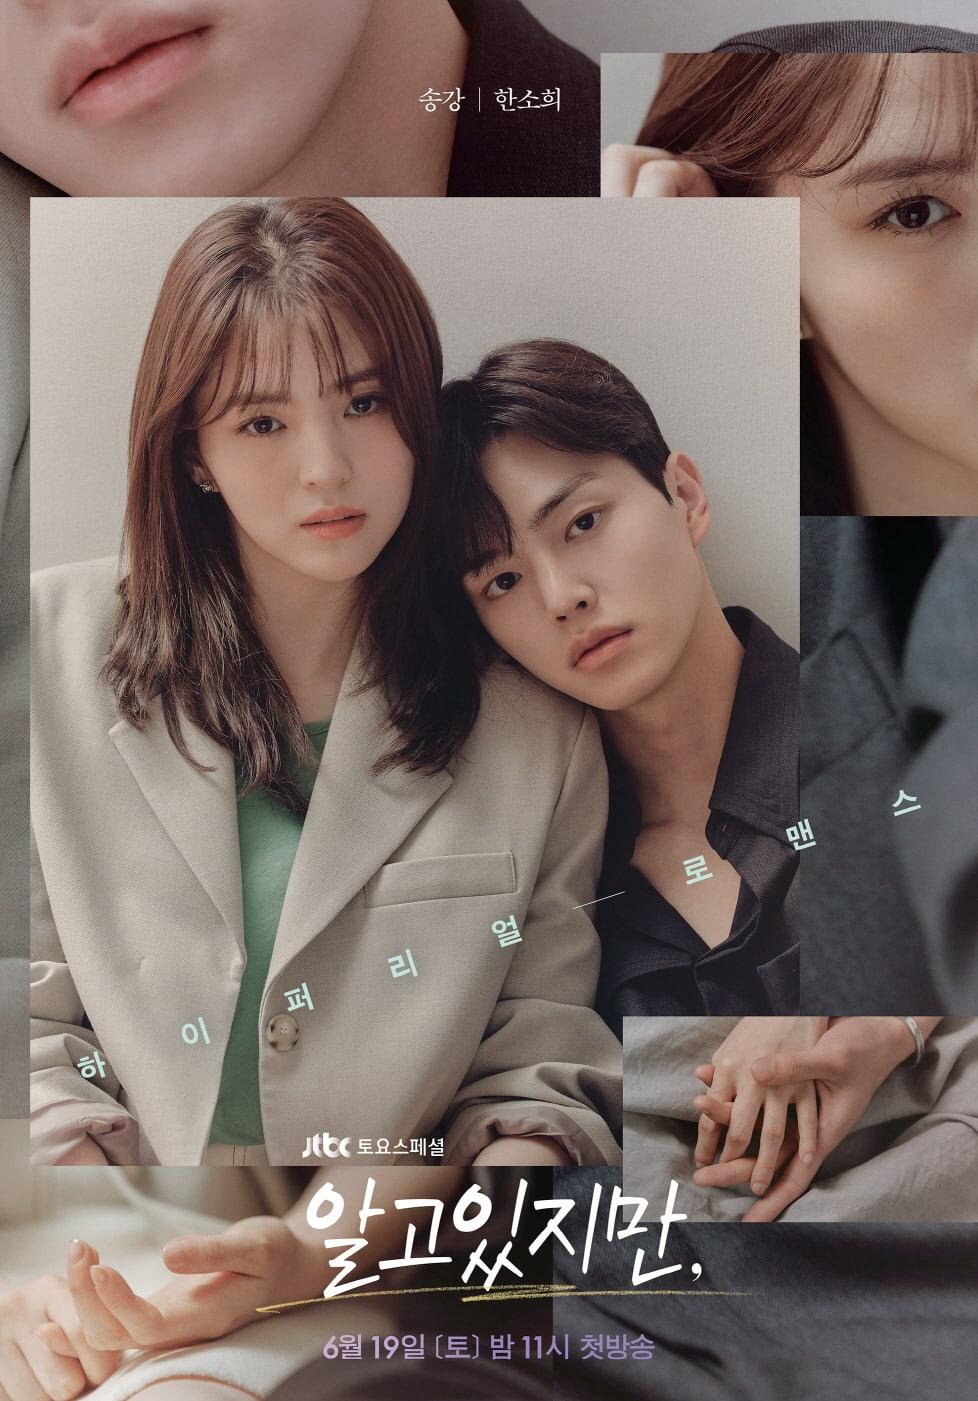 Download Drama Korea Nevertheless Subtitle Indonesia